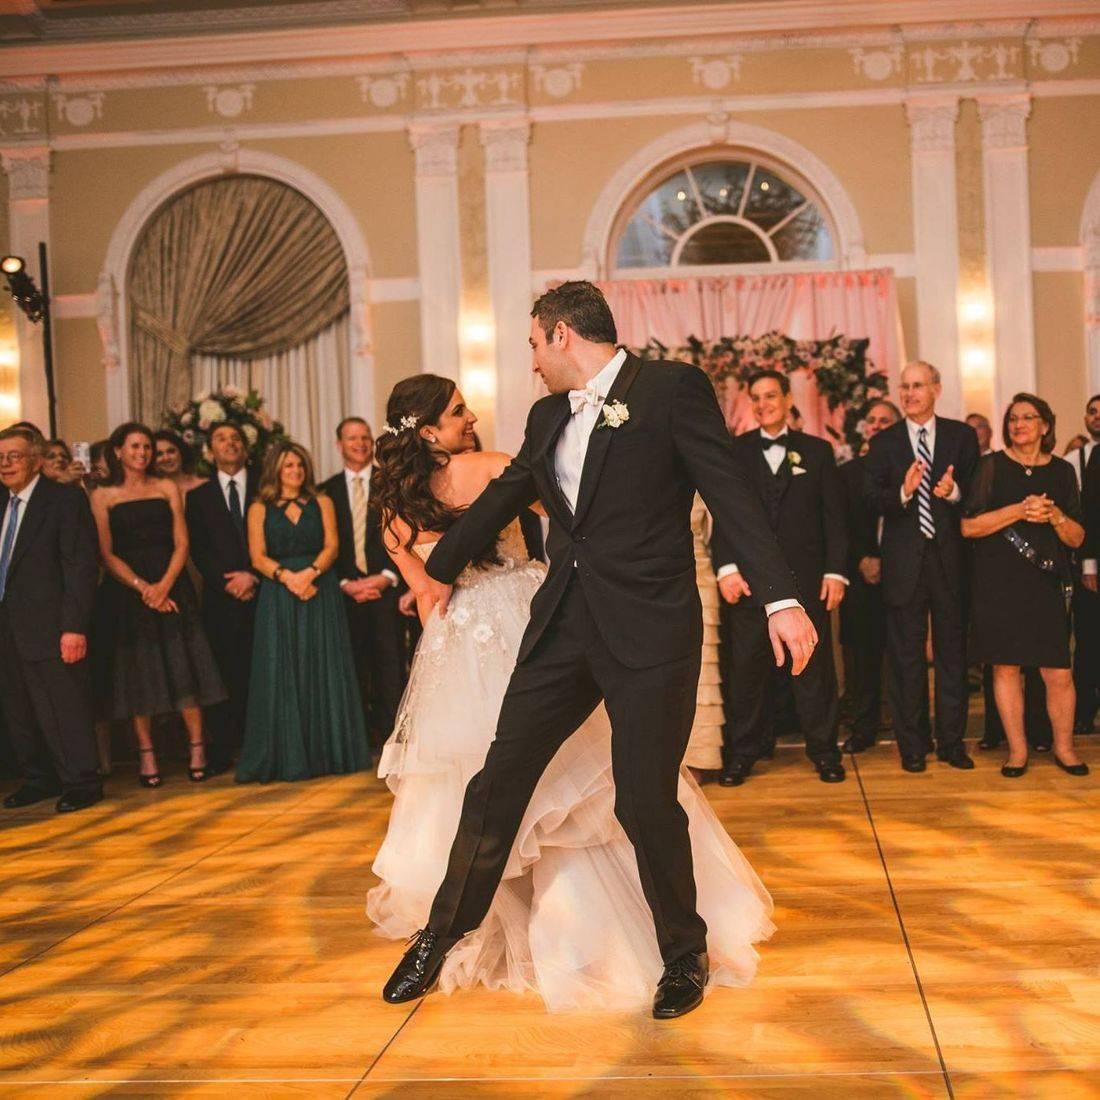 dance studio tampa, tampa bay weddings, wedding dance lessons, first dance